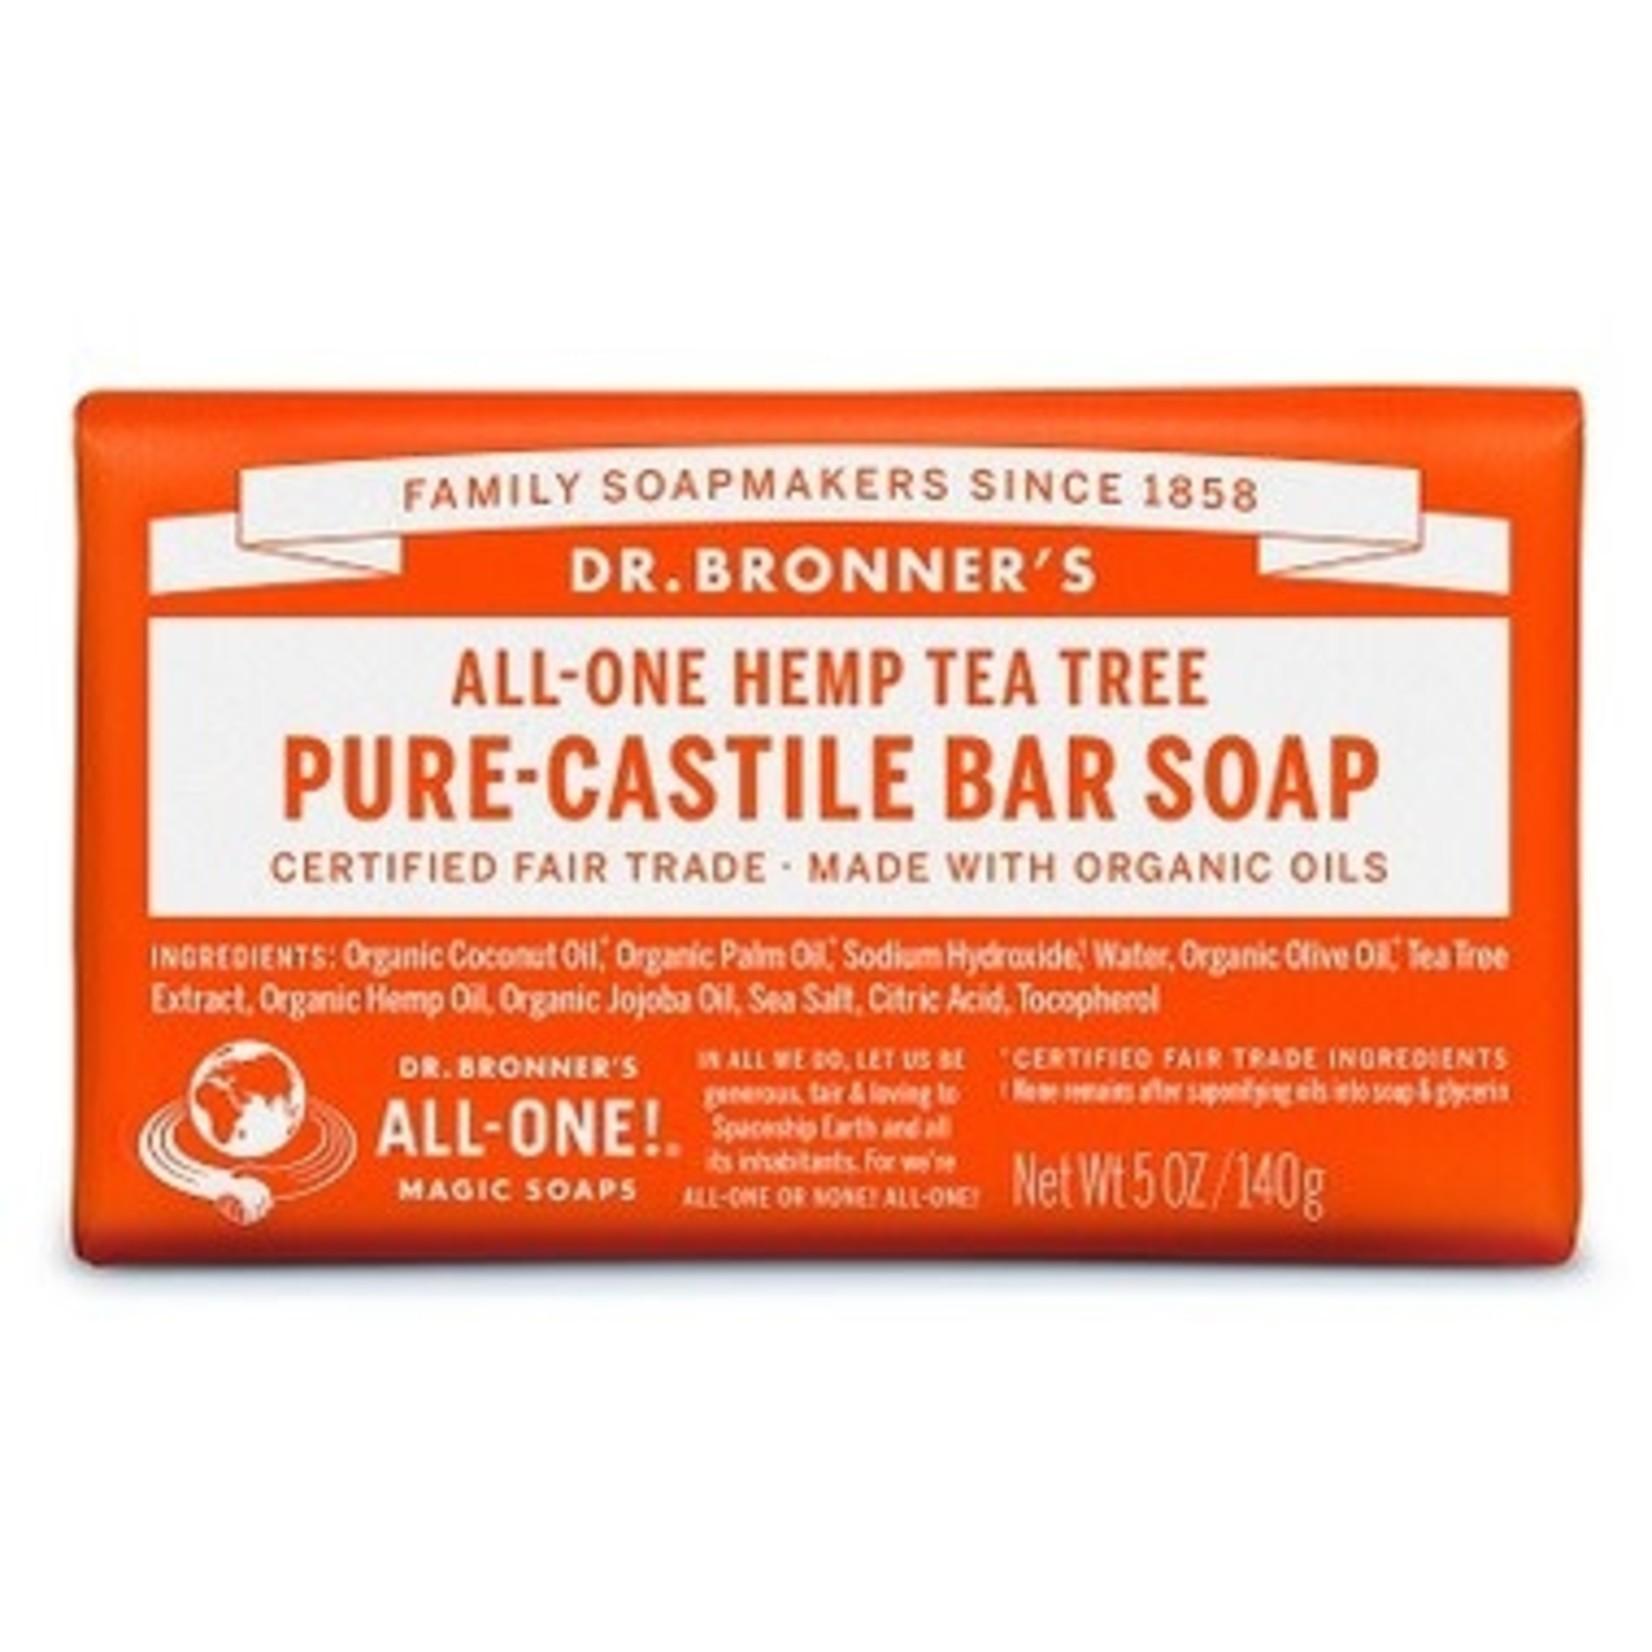 DR. BRONNER'S Pure-Castile Bar Soap - Tea Tree